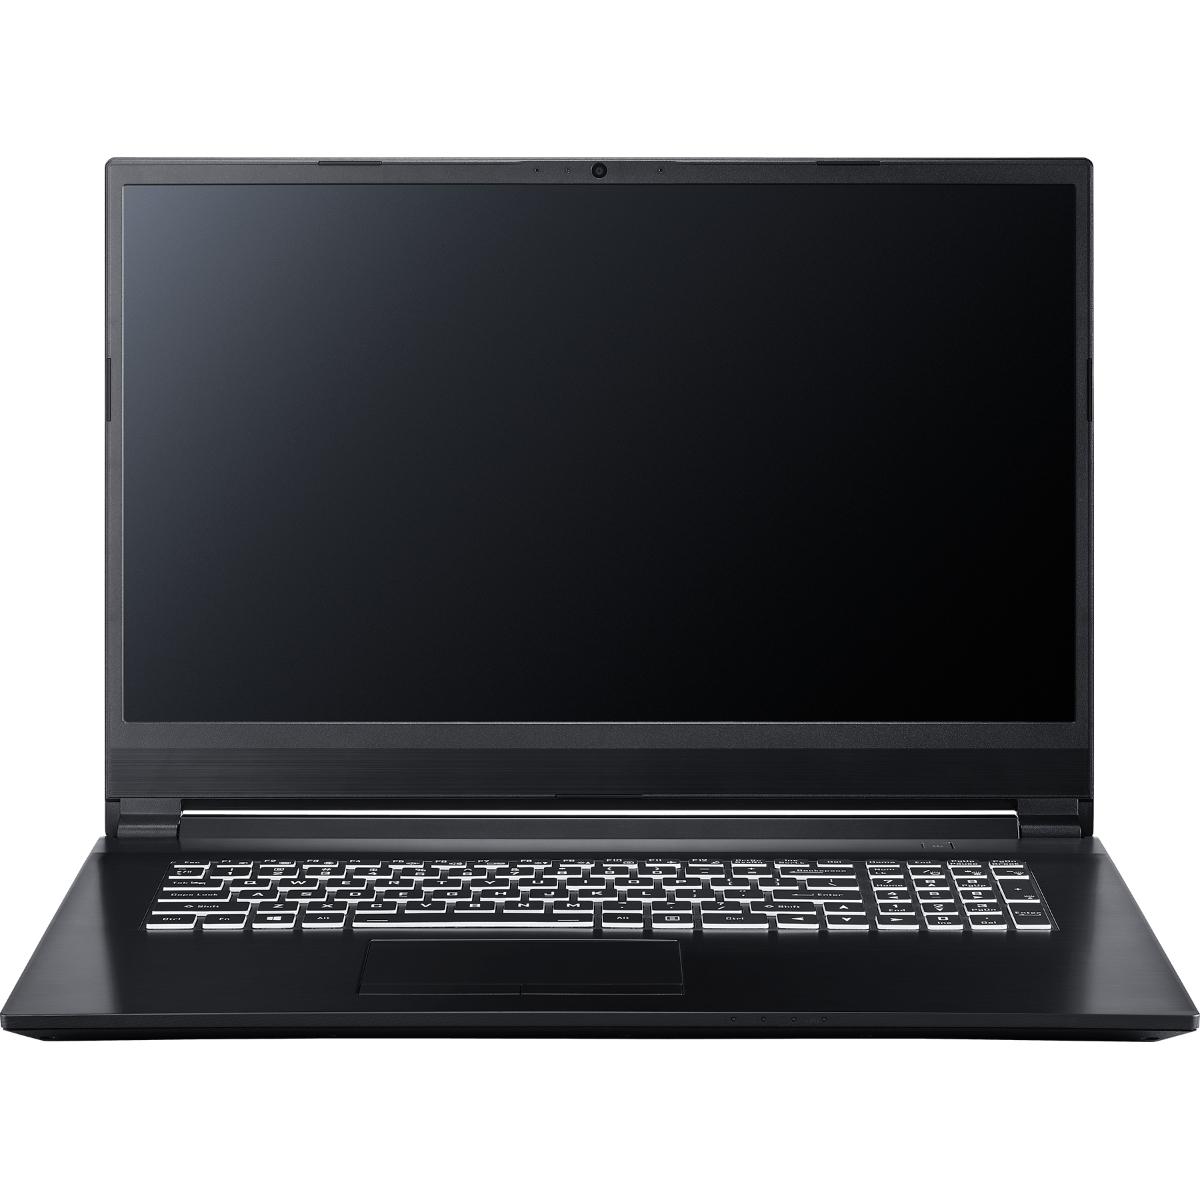 "Gaming Notebook [konfigurierbar] 17,3"" FHD IPS 144Hz, i7-8750H, RTX 2060, 8GB DDR4-2666, 250GB m2 SSD (ohne SSD=1049€)  [15,6""=1082 €]"